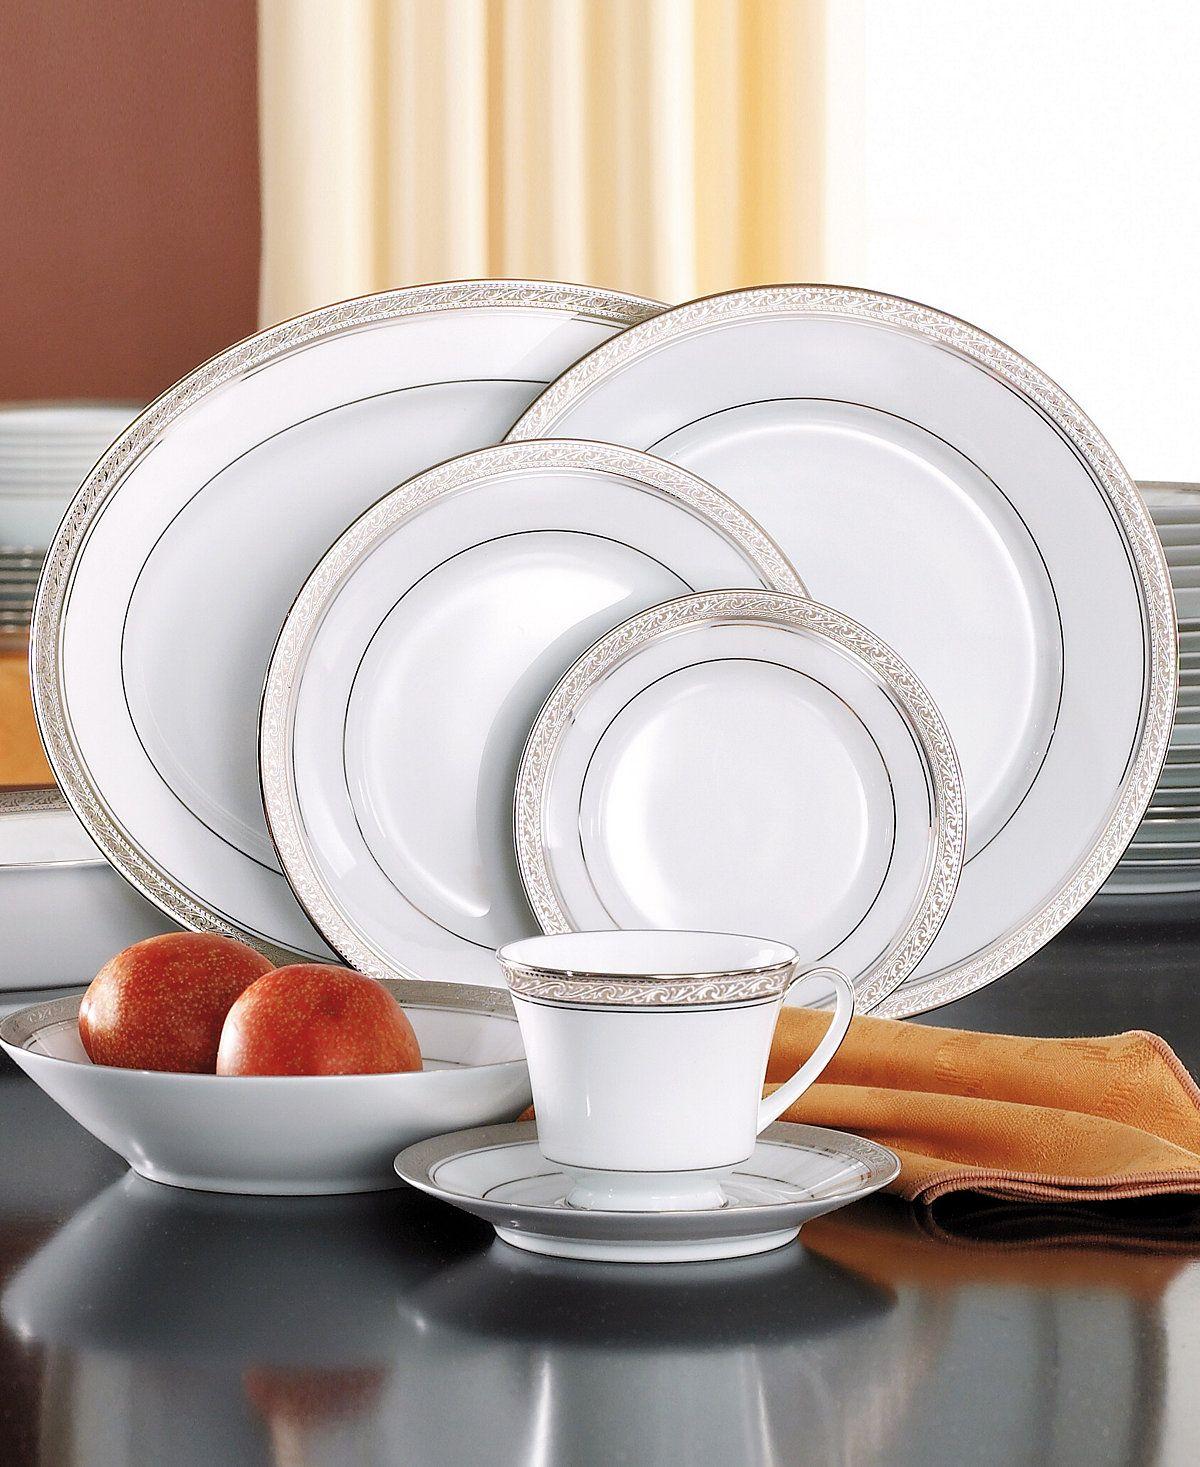 Noritake Crestwood Platinum 50-Pc. Service for 8. Fine ChinaFine DiningDinnerware ... & Noritake Crestwood Platinum 50-Pc. Service for 8 | Fine china ...